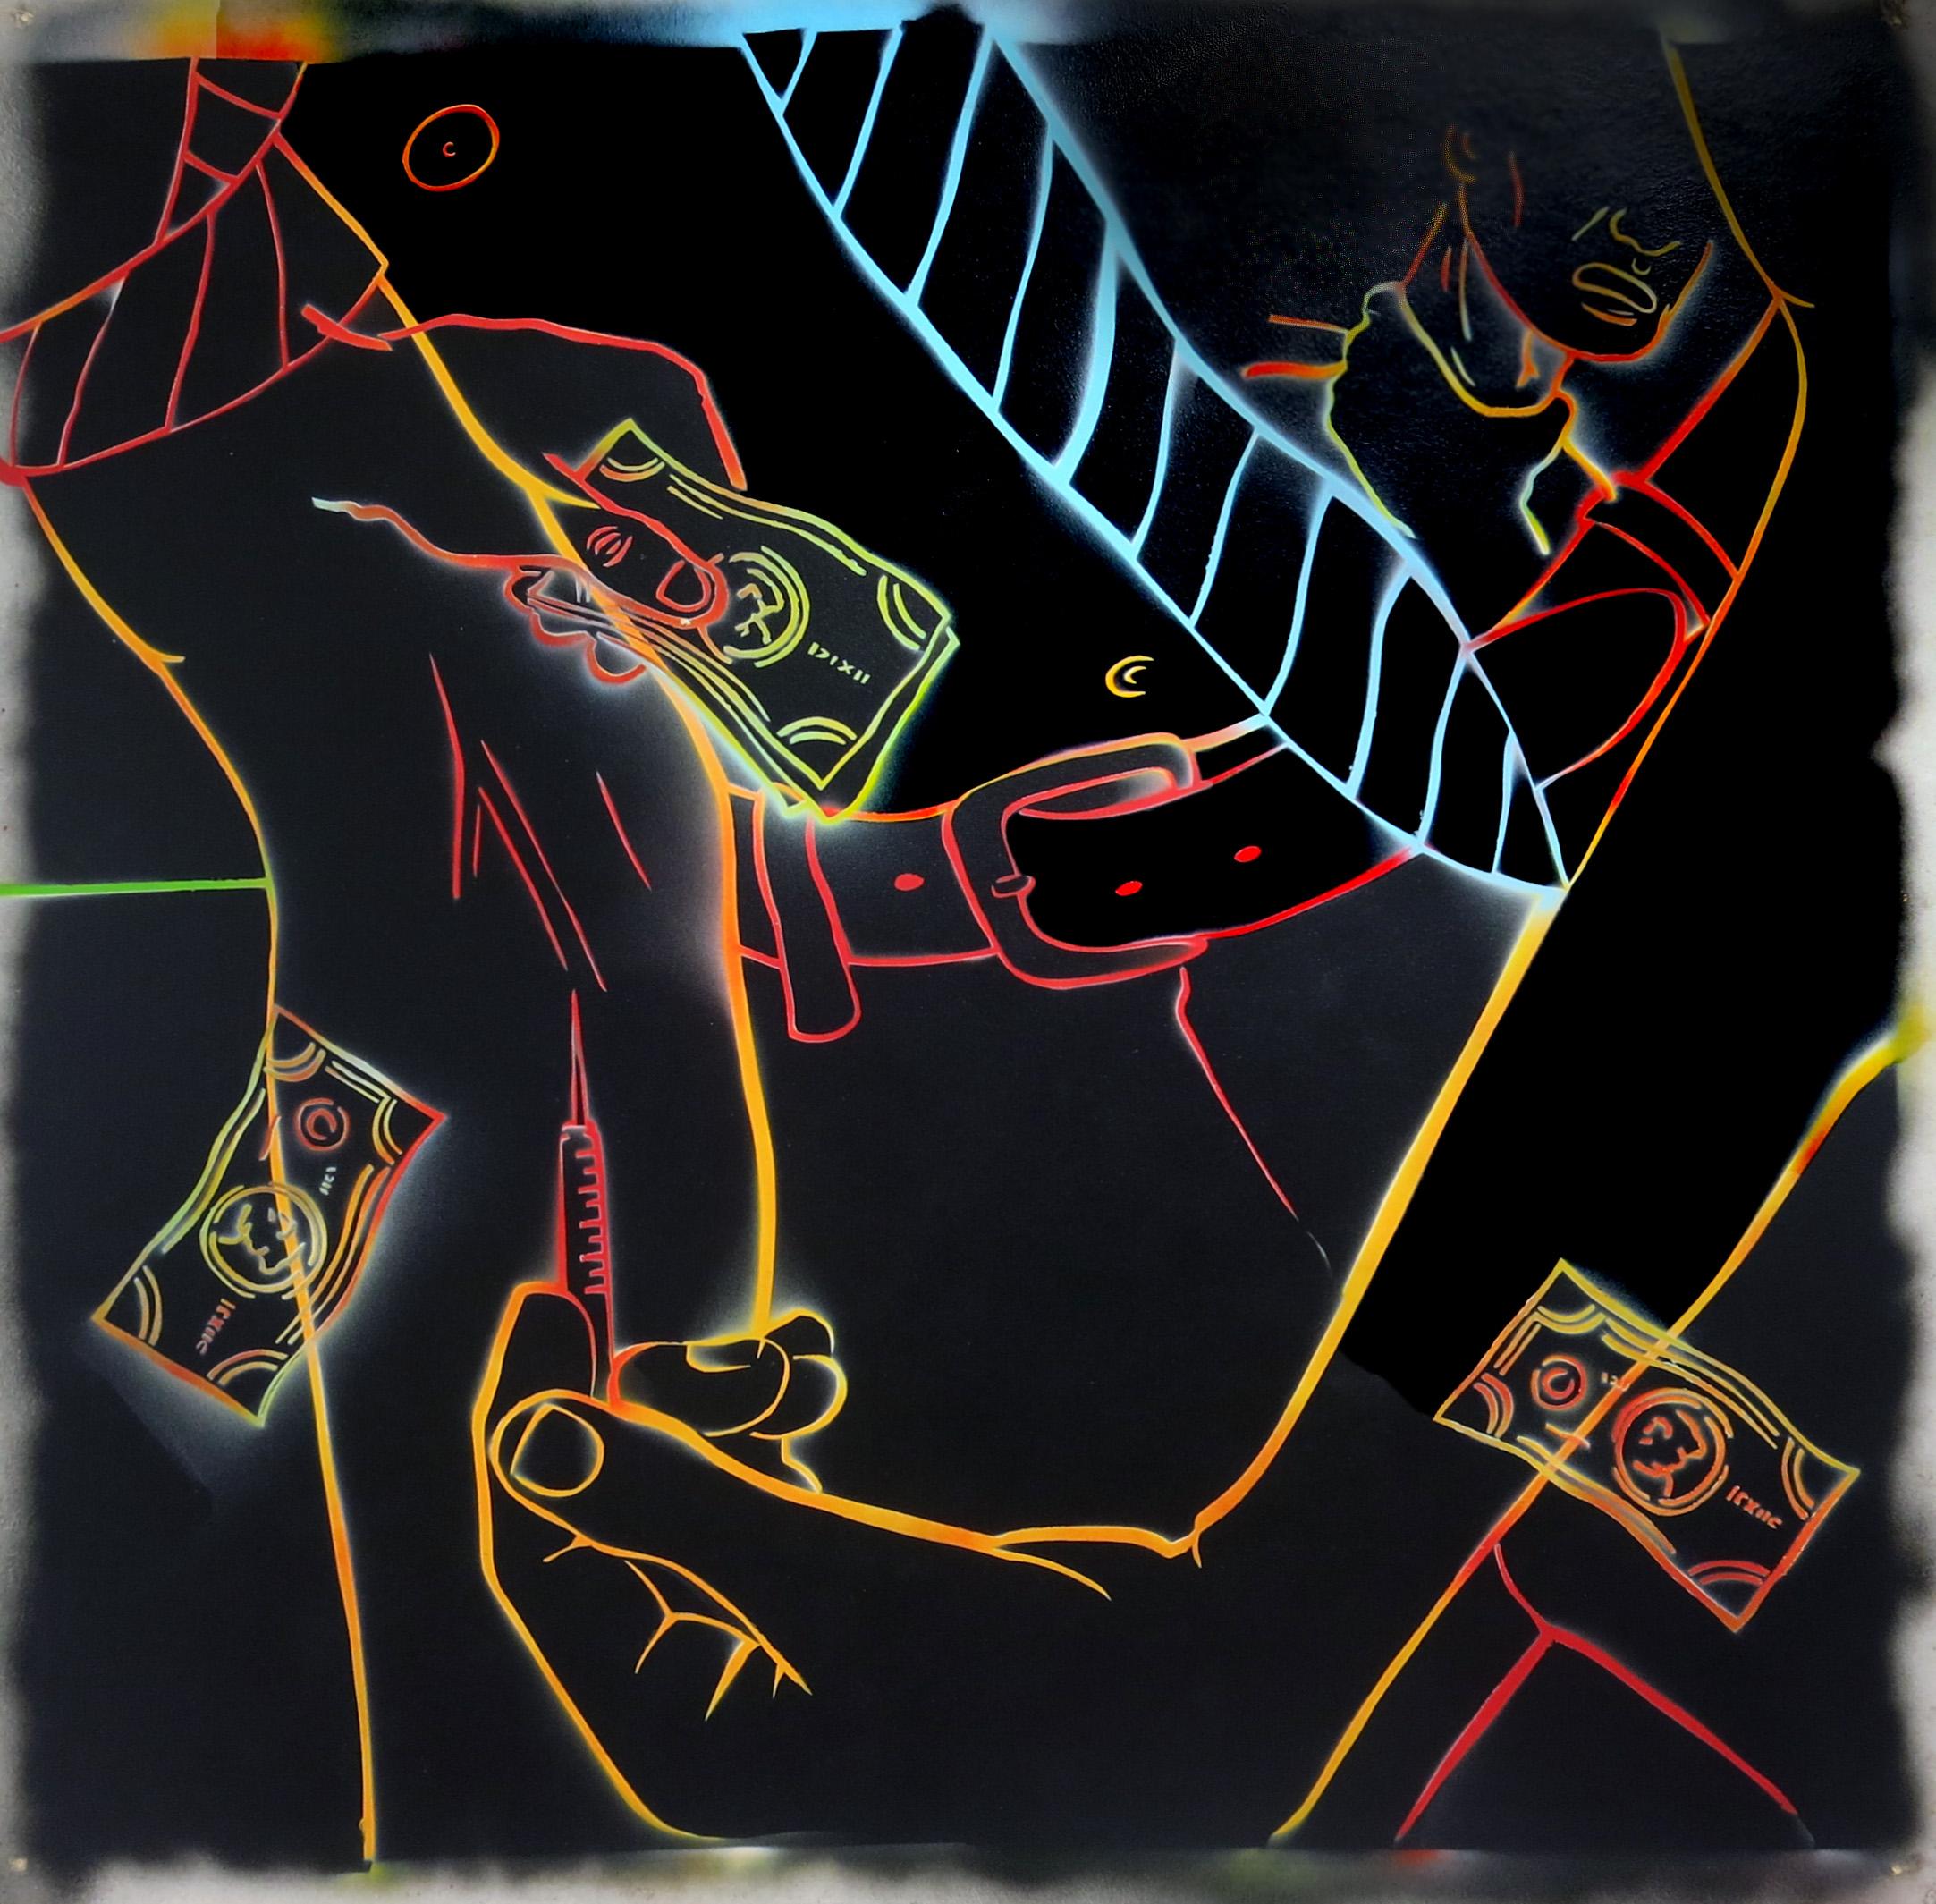 David Wojnarowicz,  Untitled (Shooting Up),  1984, enamel on masonite, 47 1/2h x 48w in.